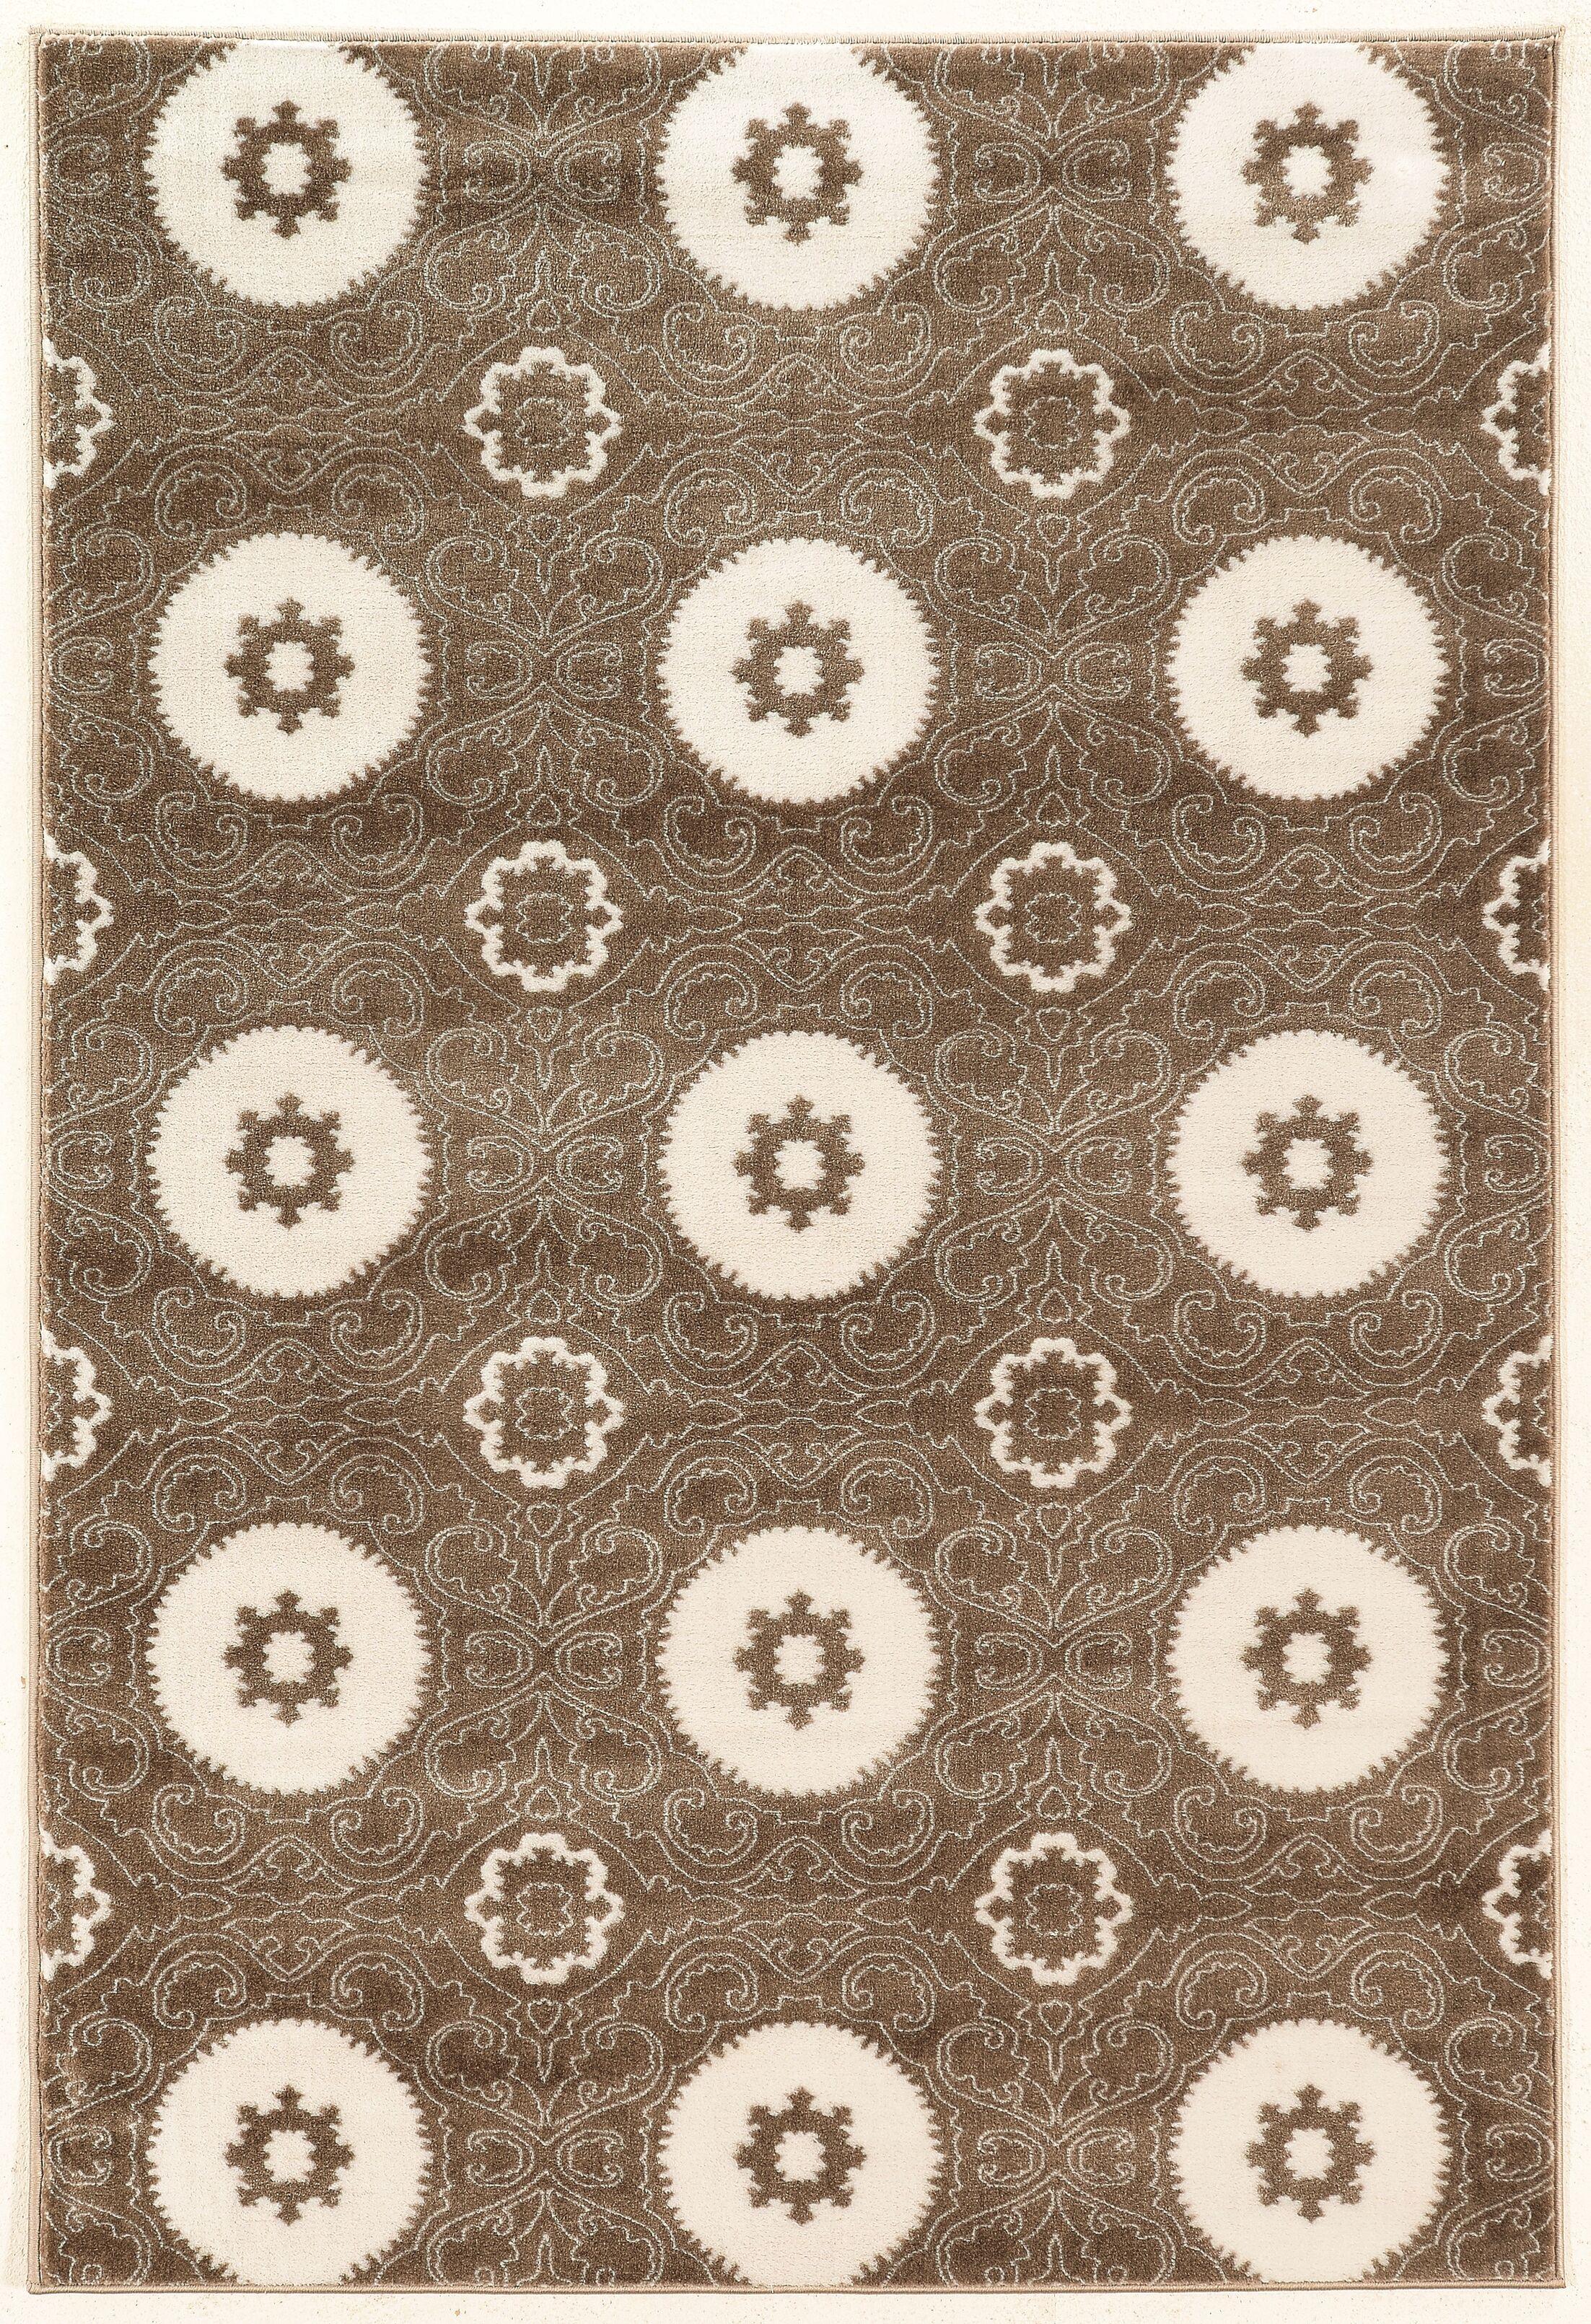 Lucinda Dark Brown Area Rug Rug Size: Rectangle 5' x 7'